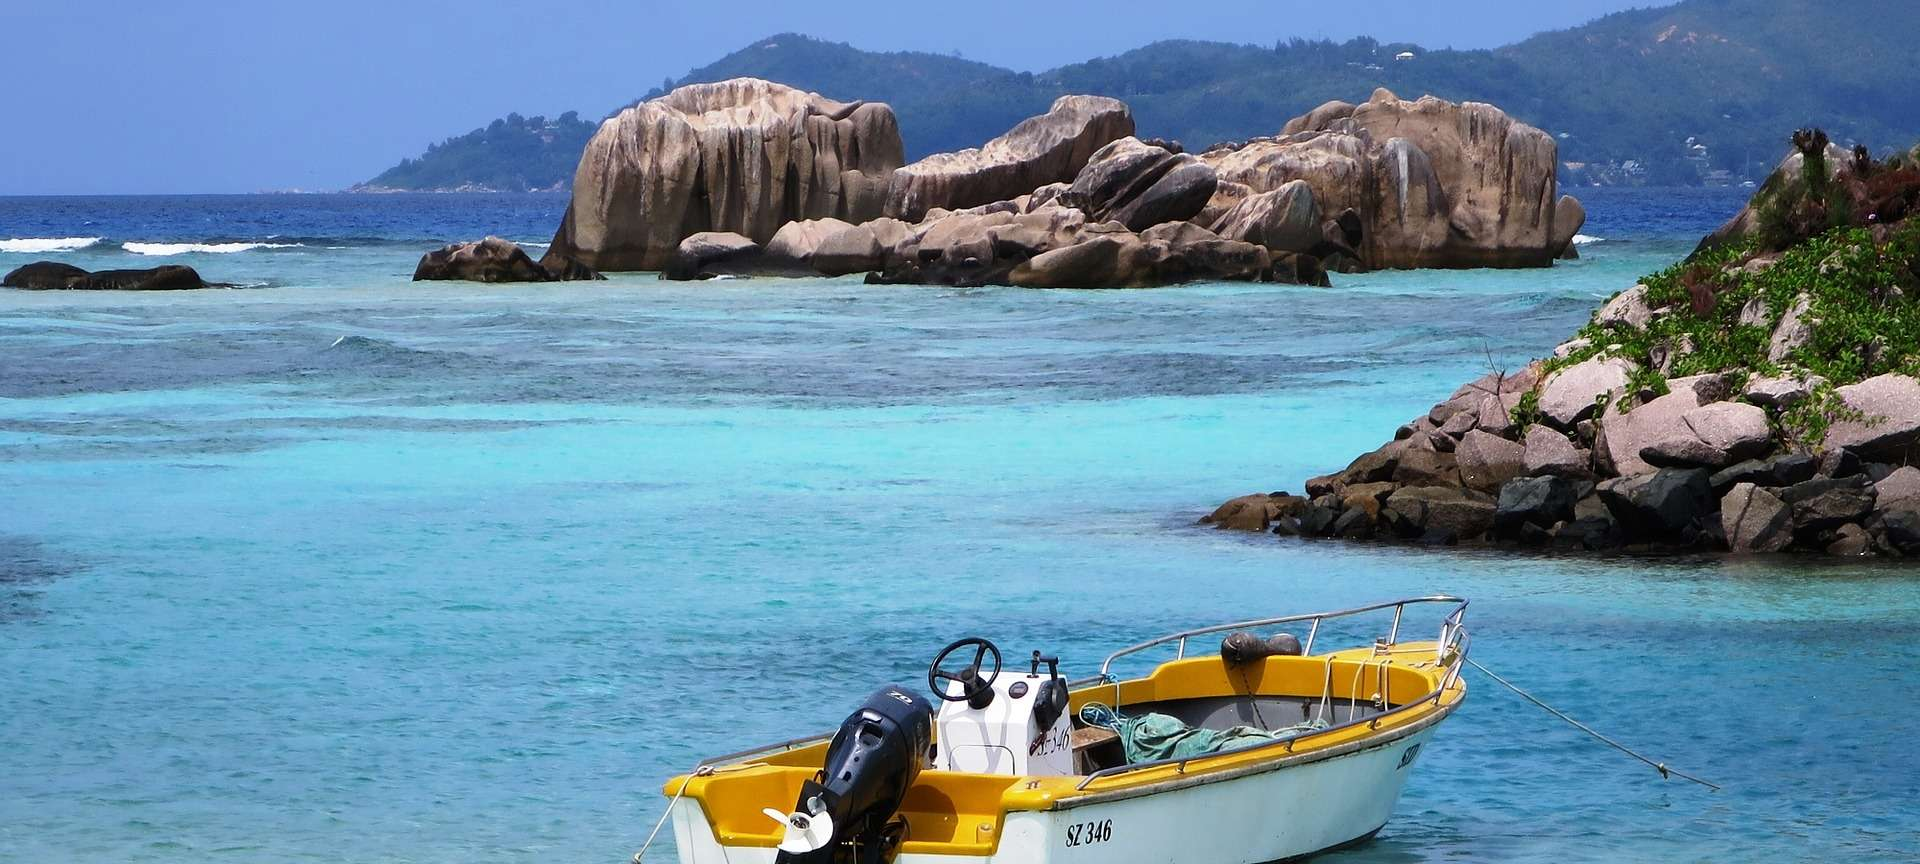 Seychelles - Africa Wildlife Safaris